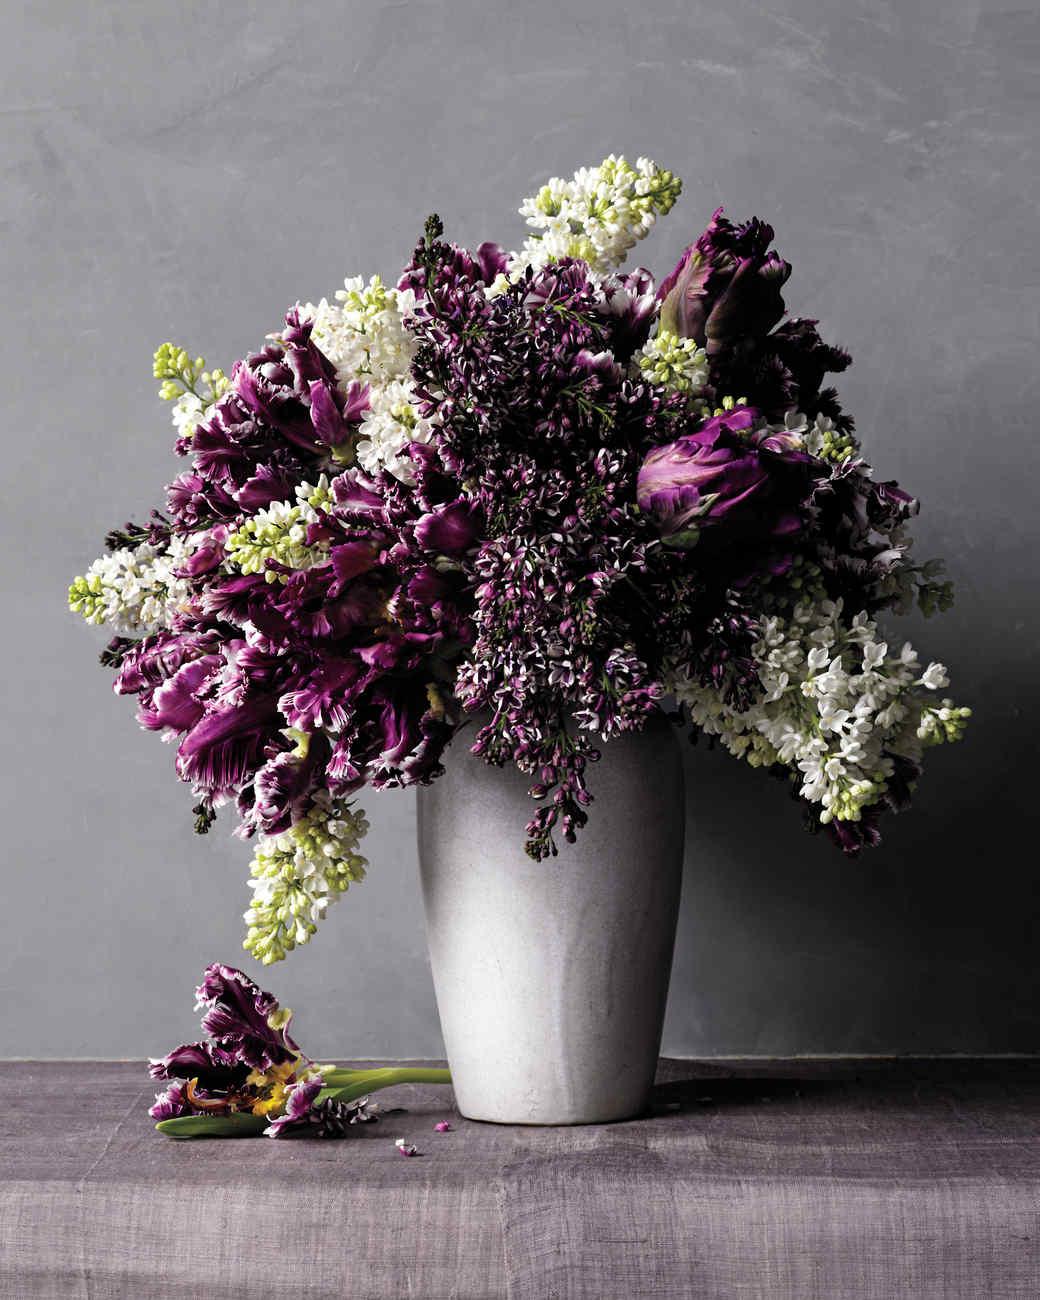 lilacs-flower-arrangement-n-comp-d111001.jpg